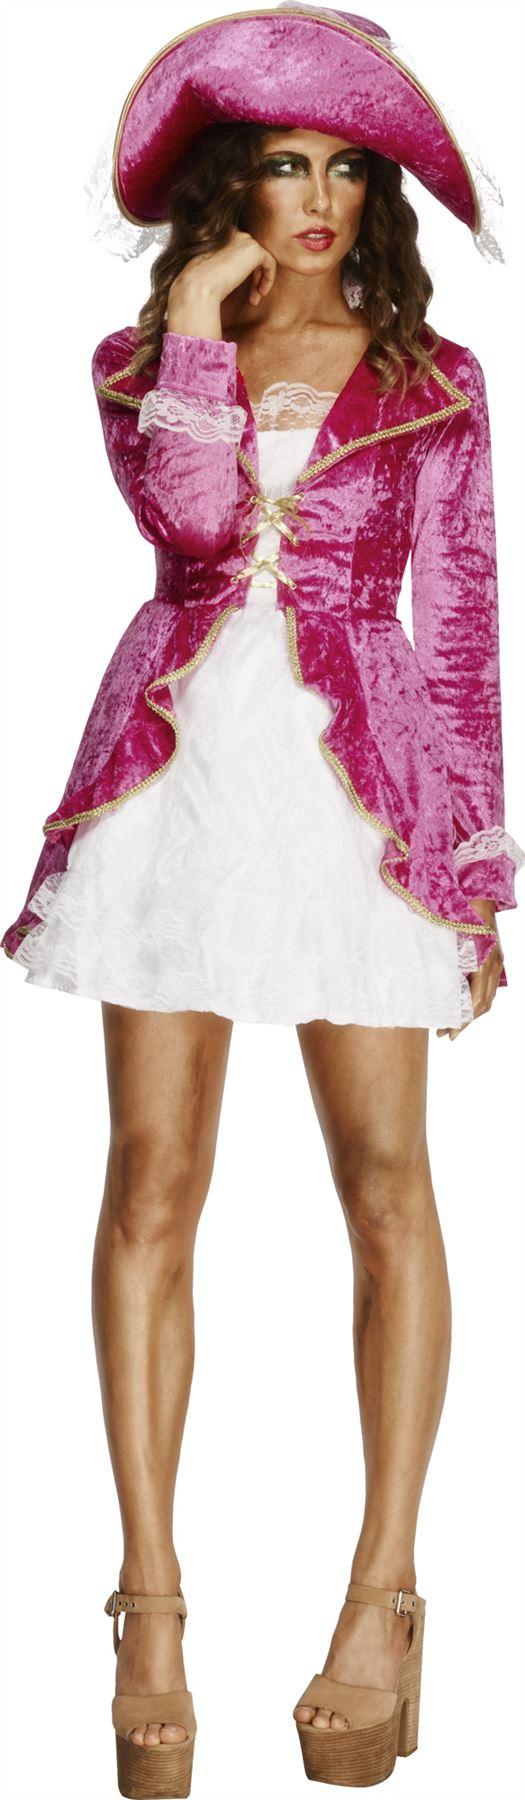 Smiffy-039-s-Femmes-Rose-Pirates-Chasse-Deguisement-30731